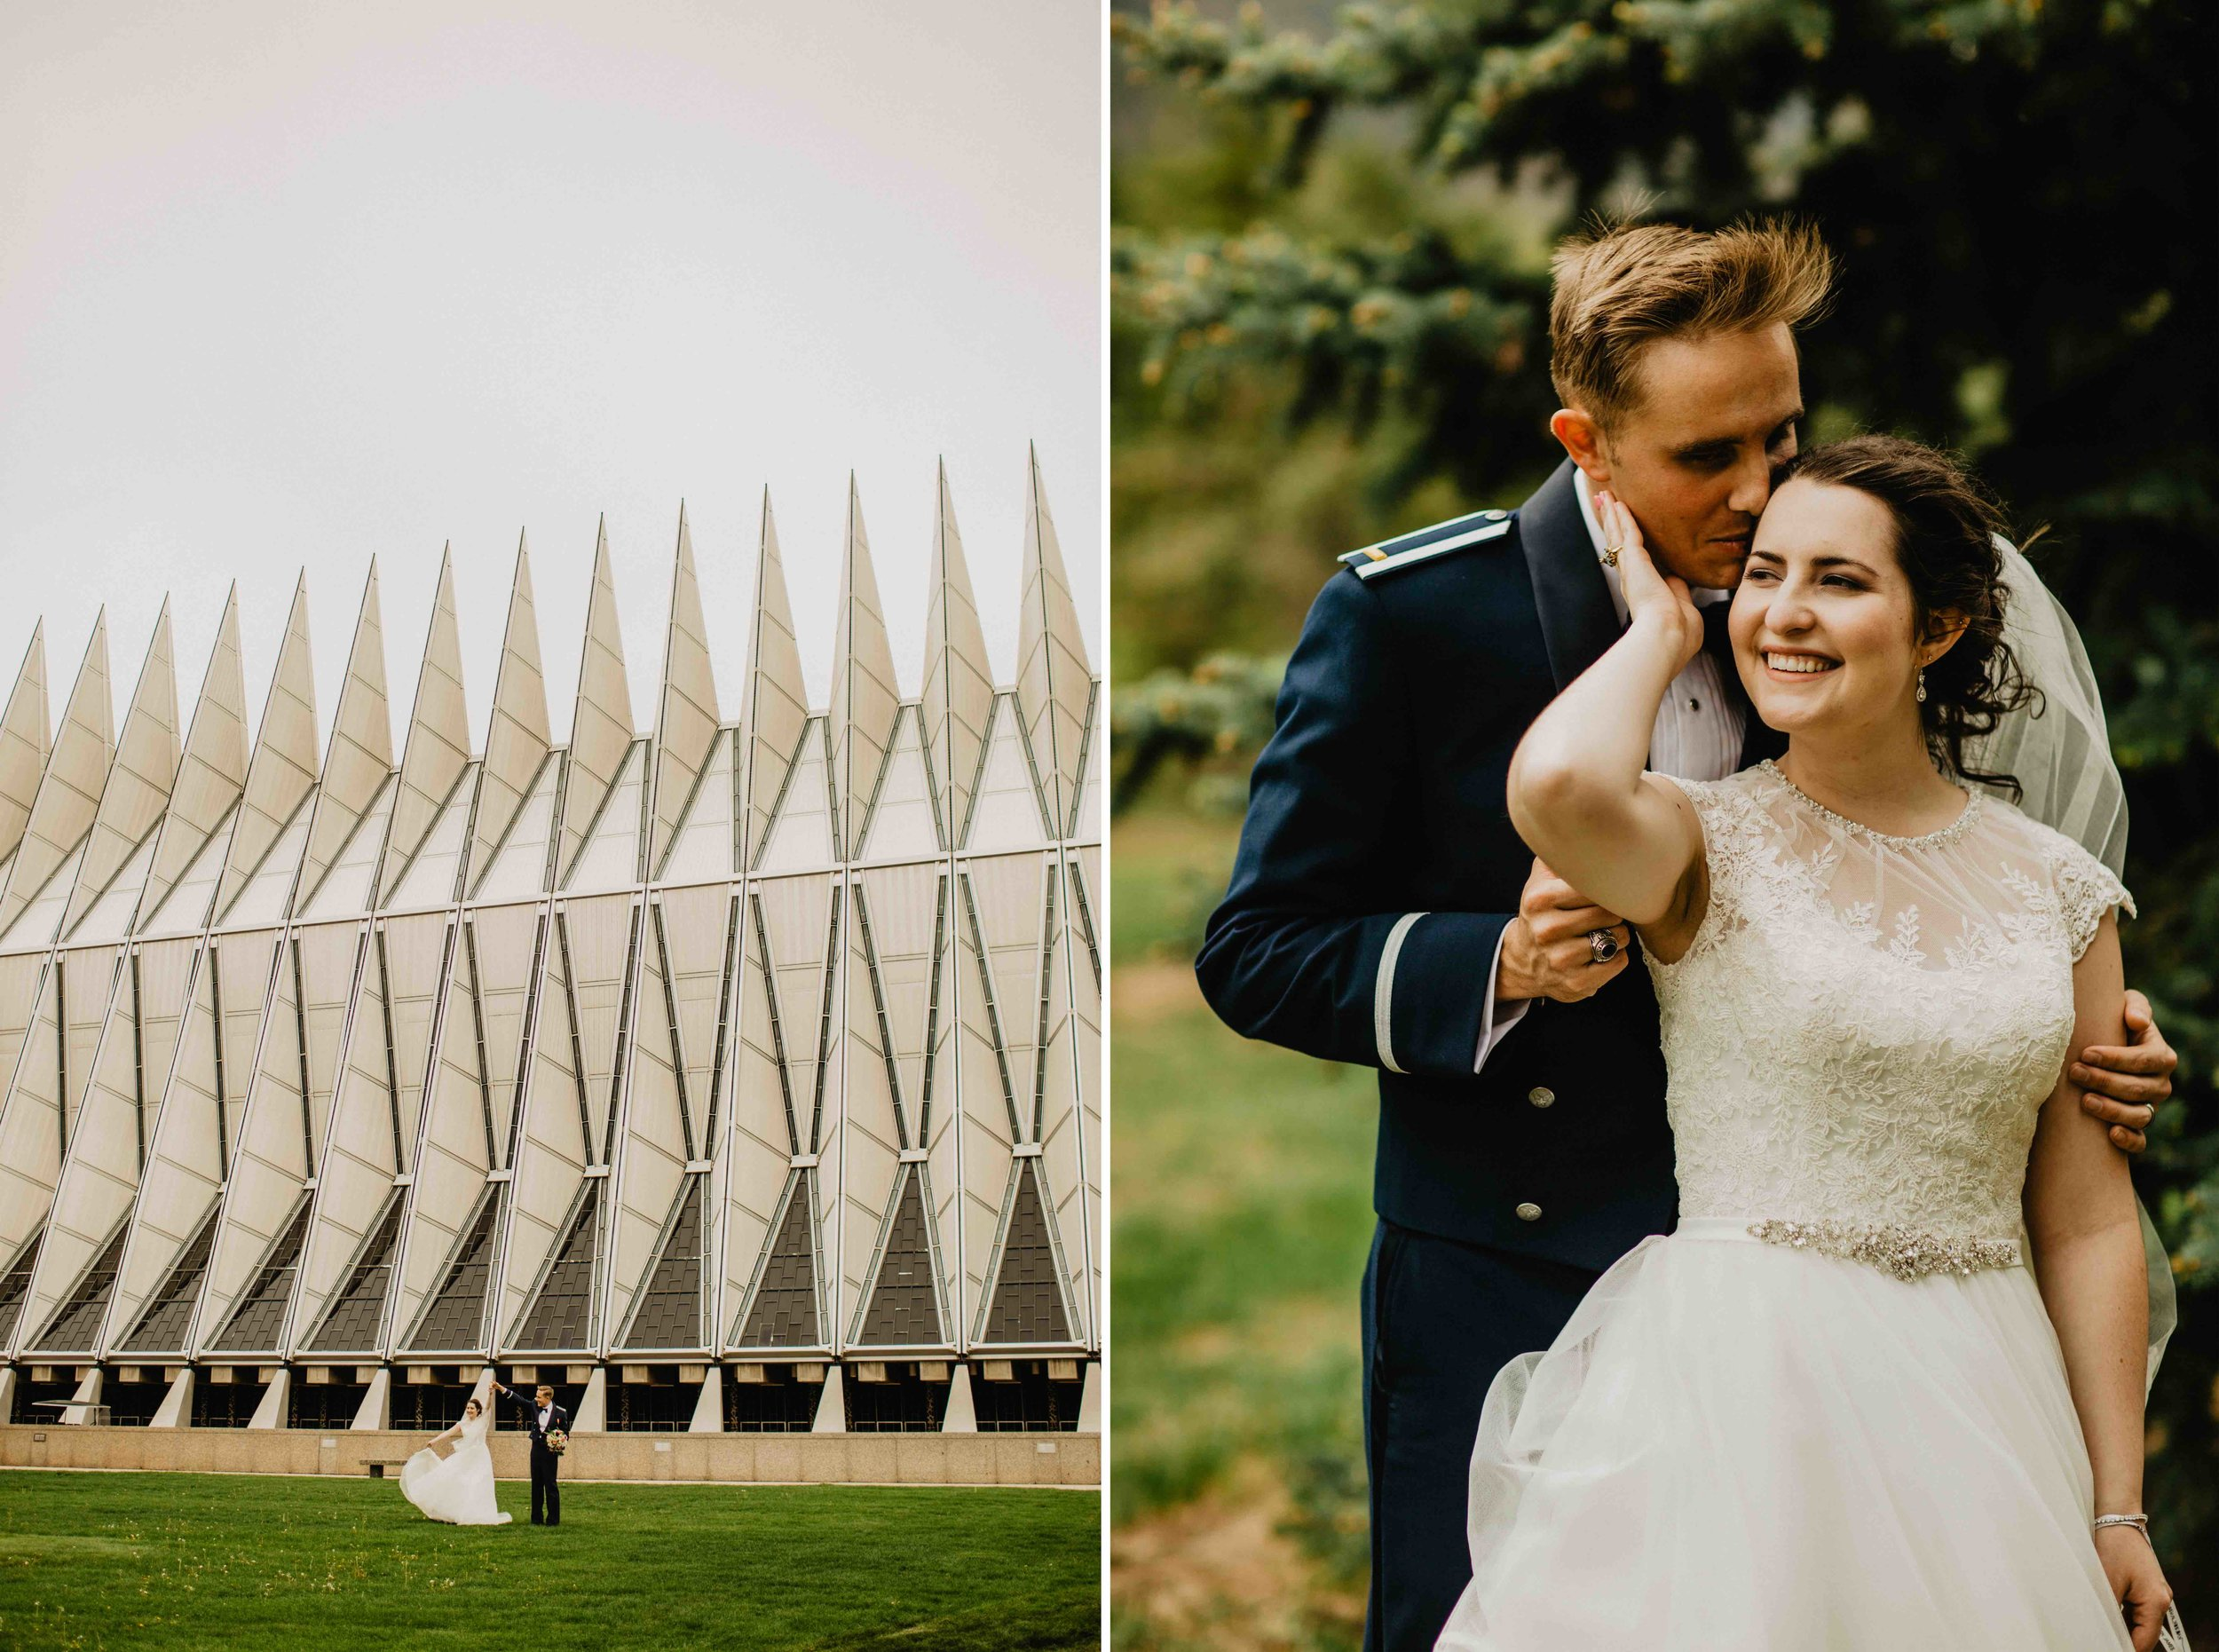 607A5956-colorado-wedding-photographer-denver-springs-vail--colorado-wedding-photographer-denver-springs-vail-.jpeg